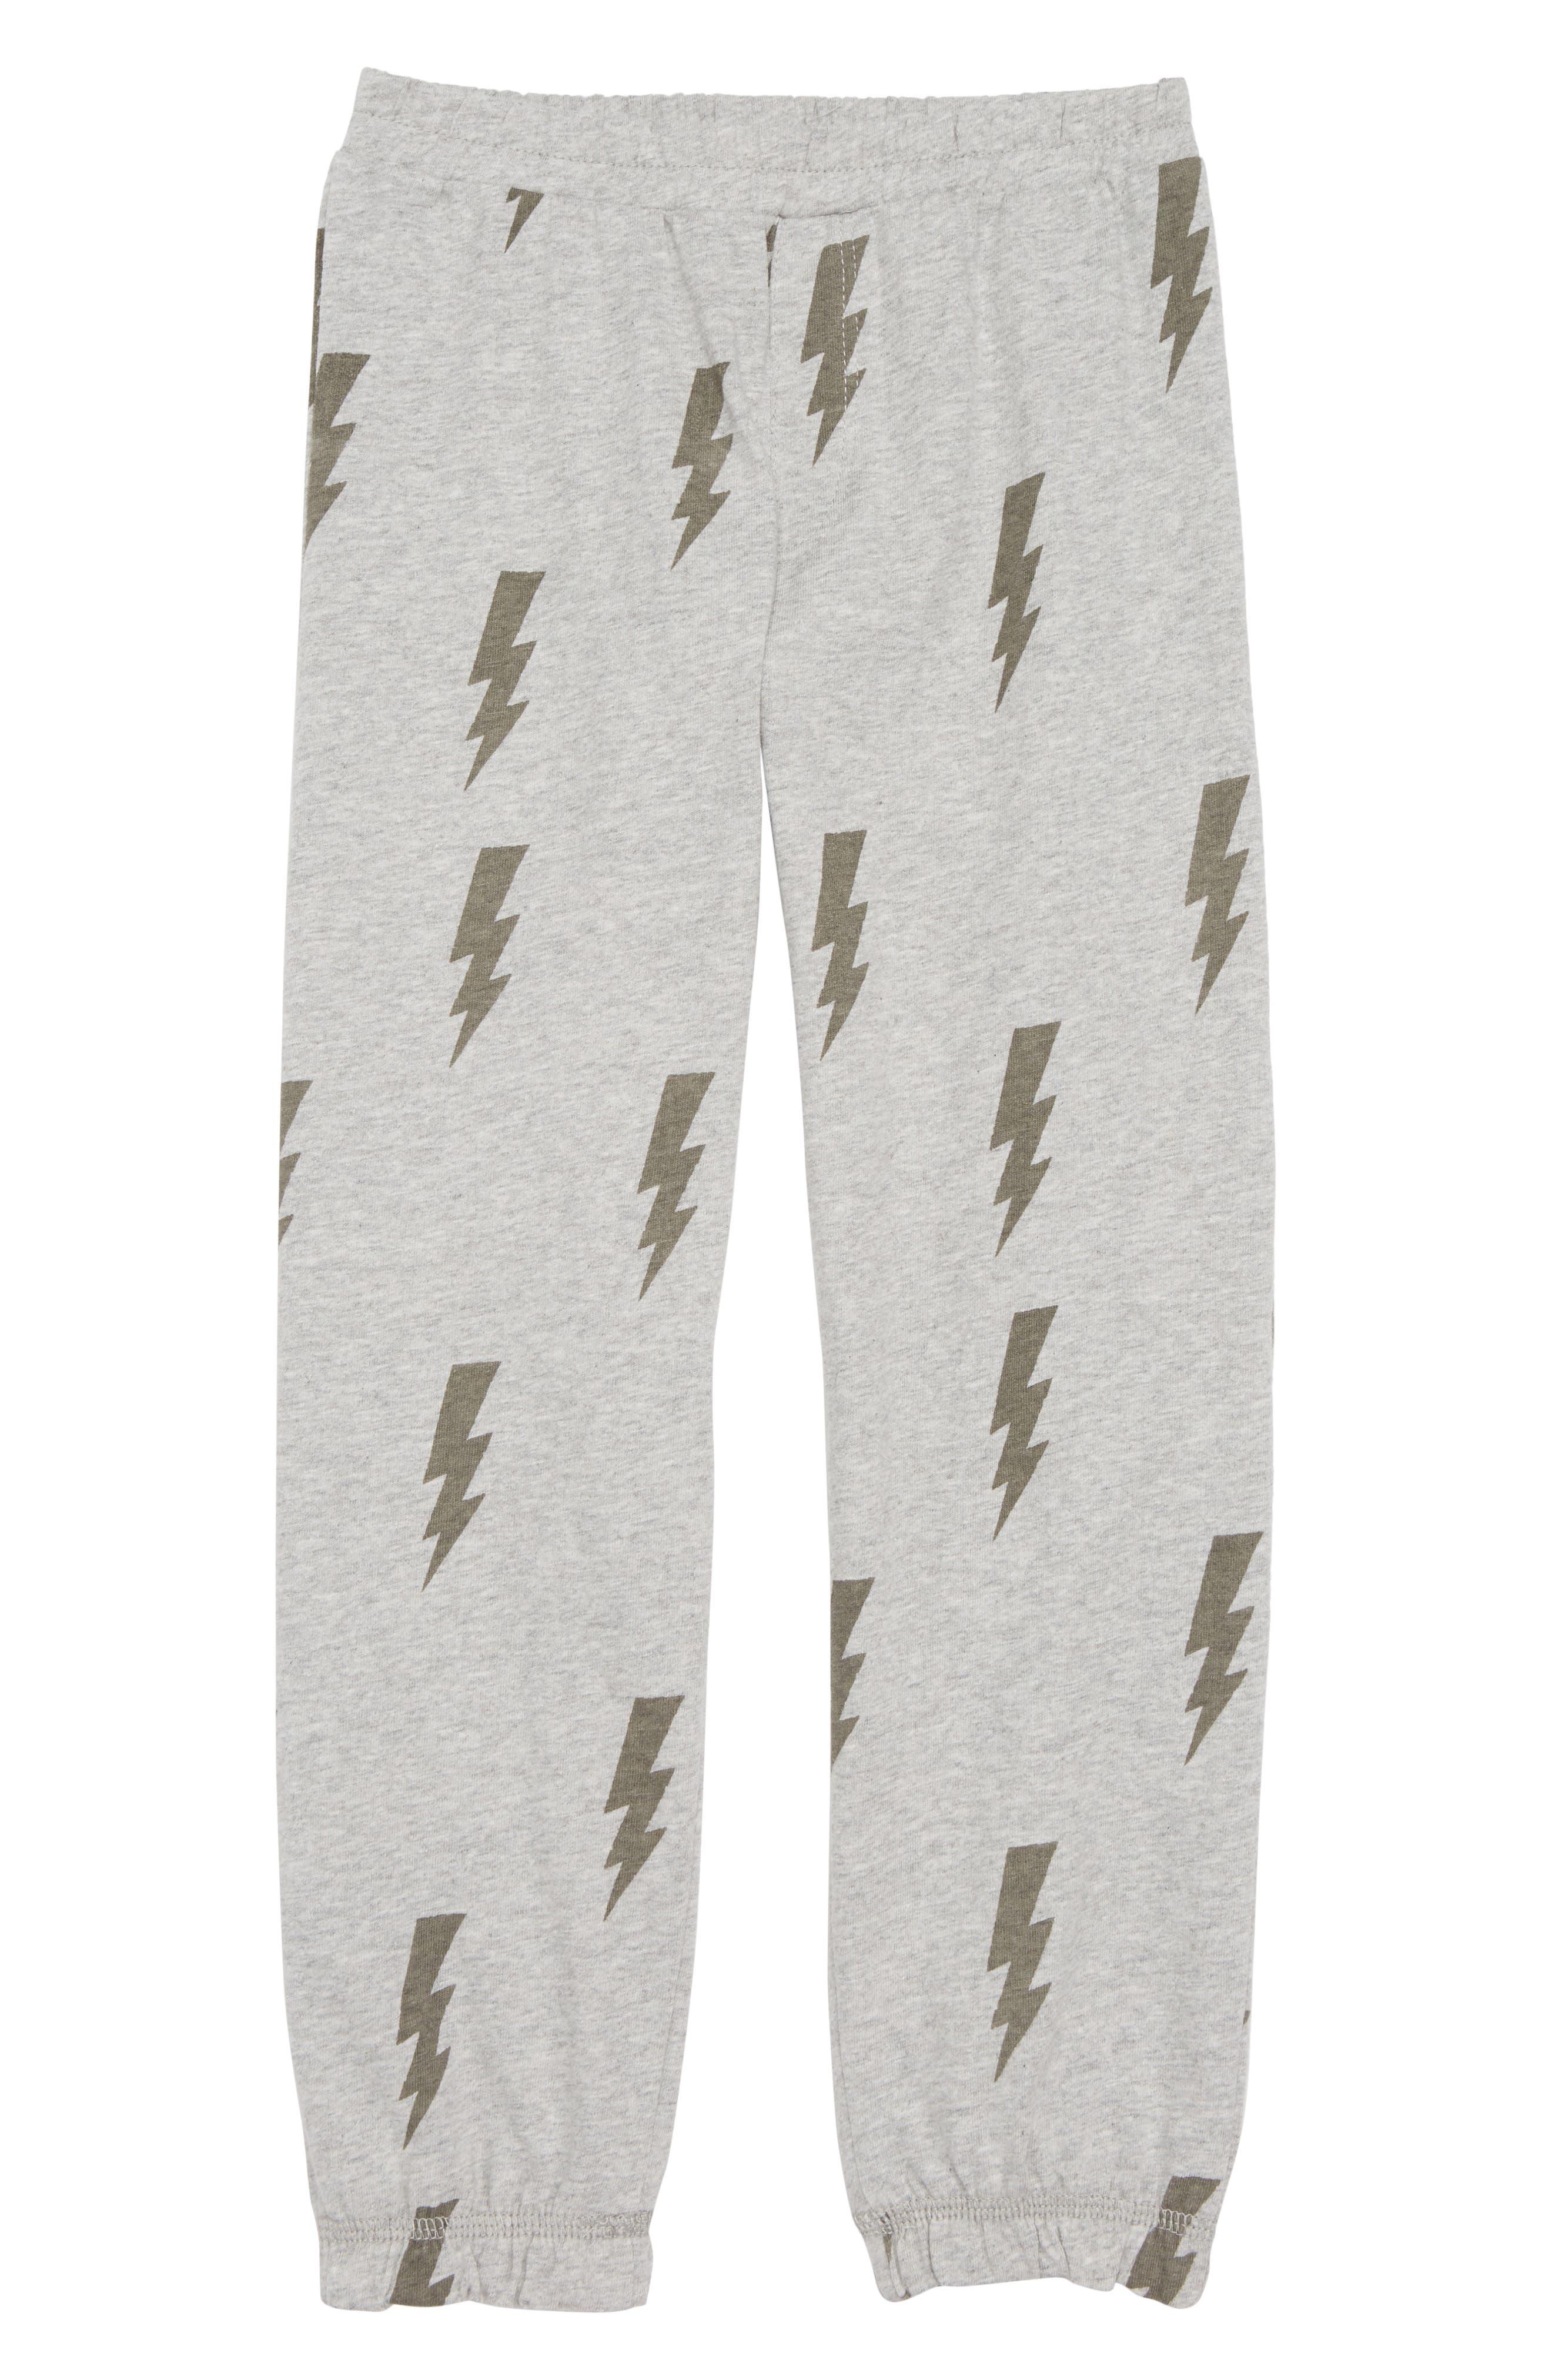 Lightning Toss Pants,                             Main thumbnail 1, color,                             Heather Gray